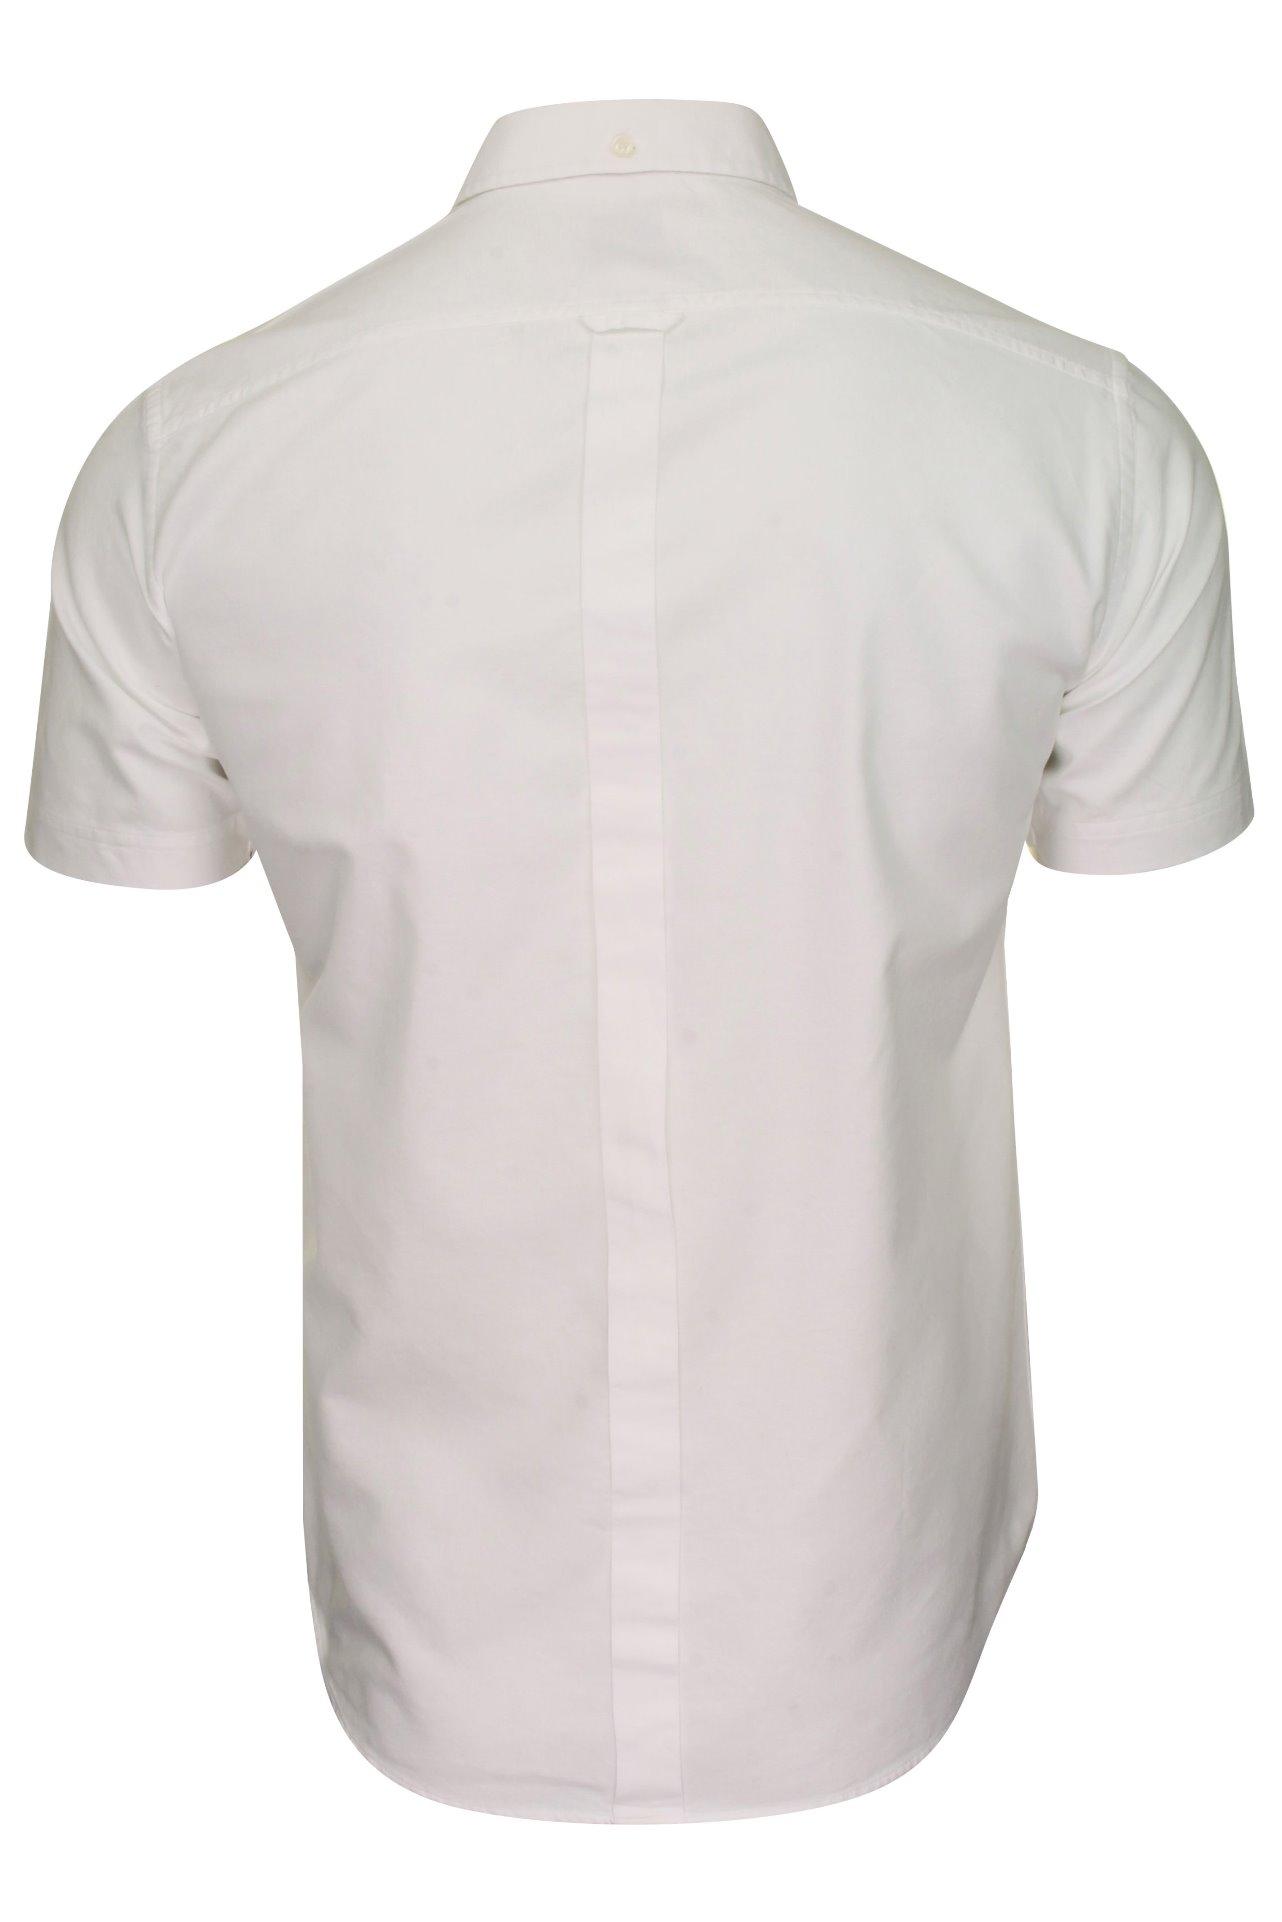 Details about  /Ben Sherman Mens Oxford Shirt Short Sleeved